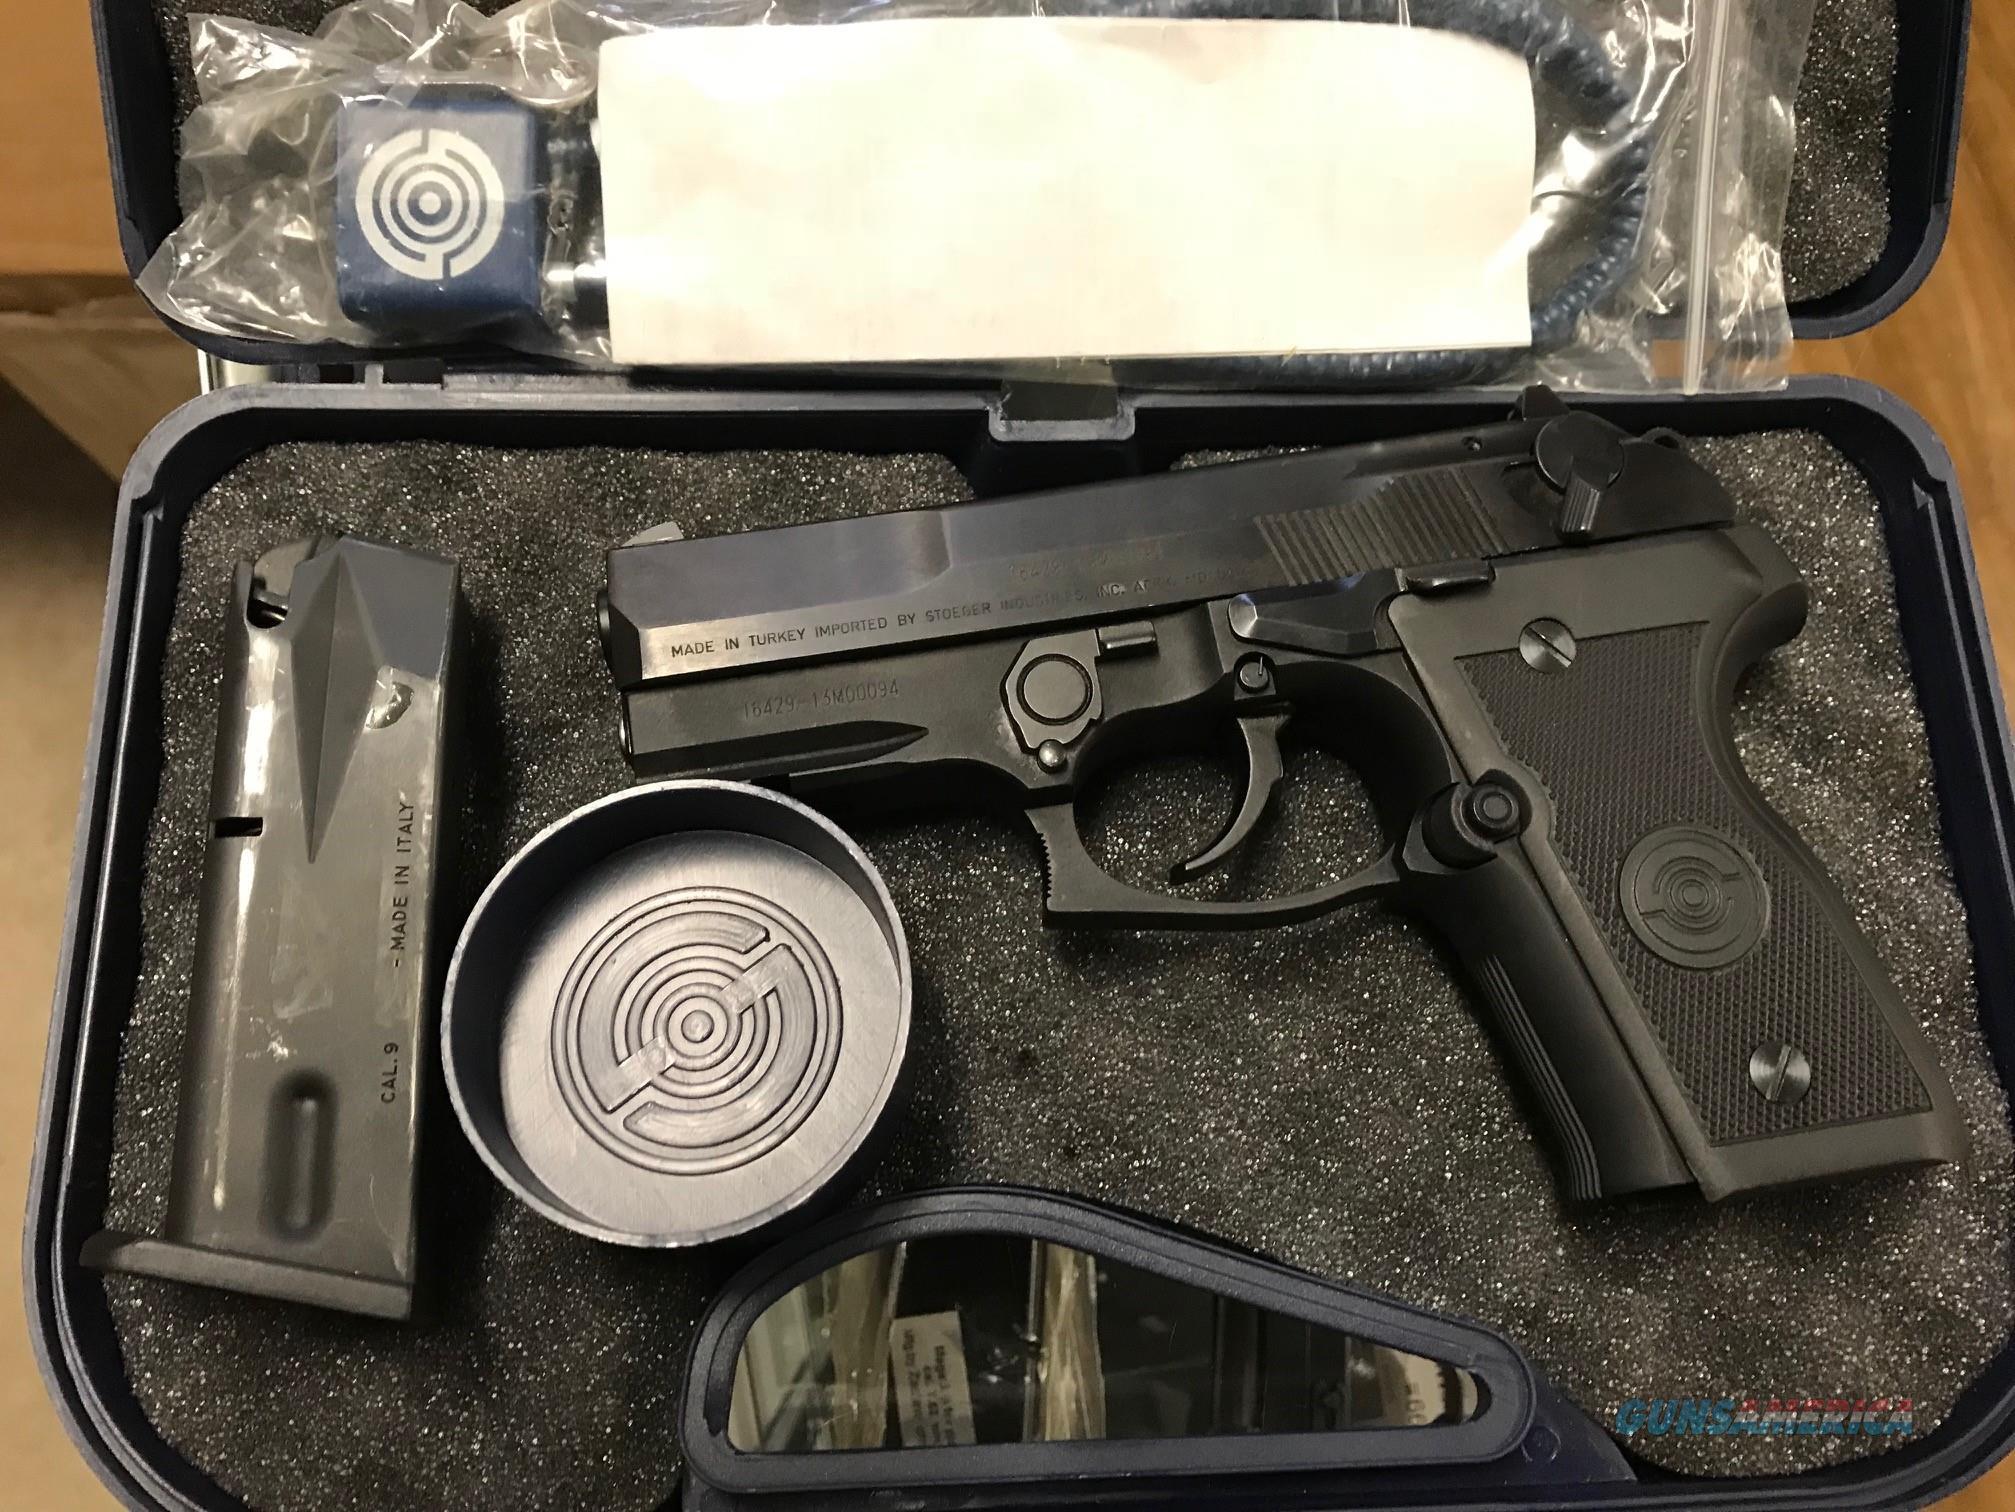 Stoeger Couger 8000 LT  Guns > Pistols > Beretta Pistols > Model 92 Series